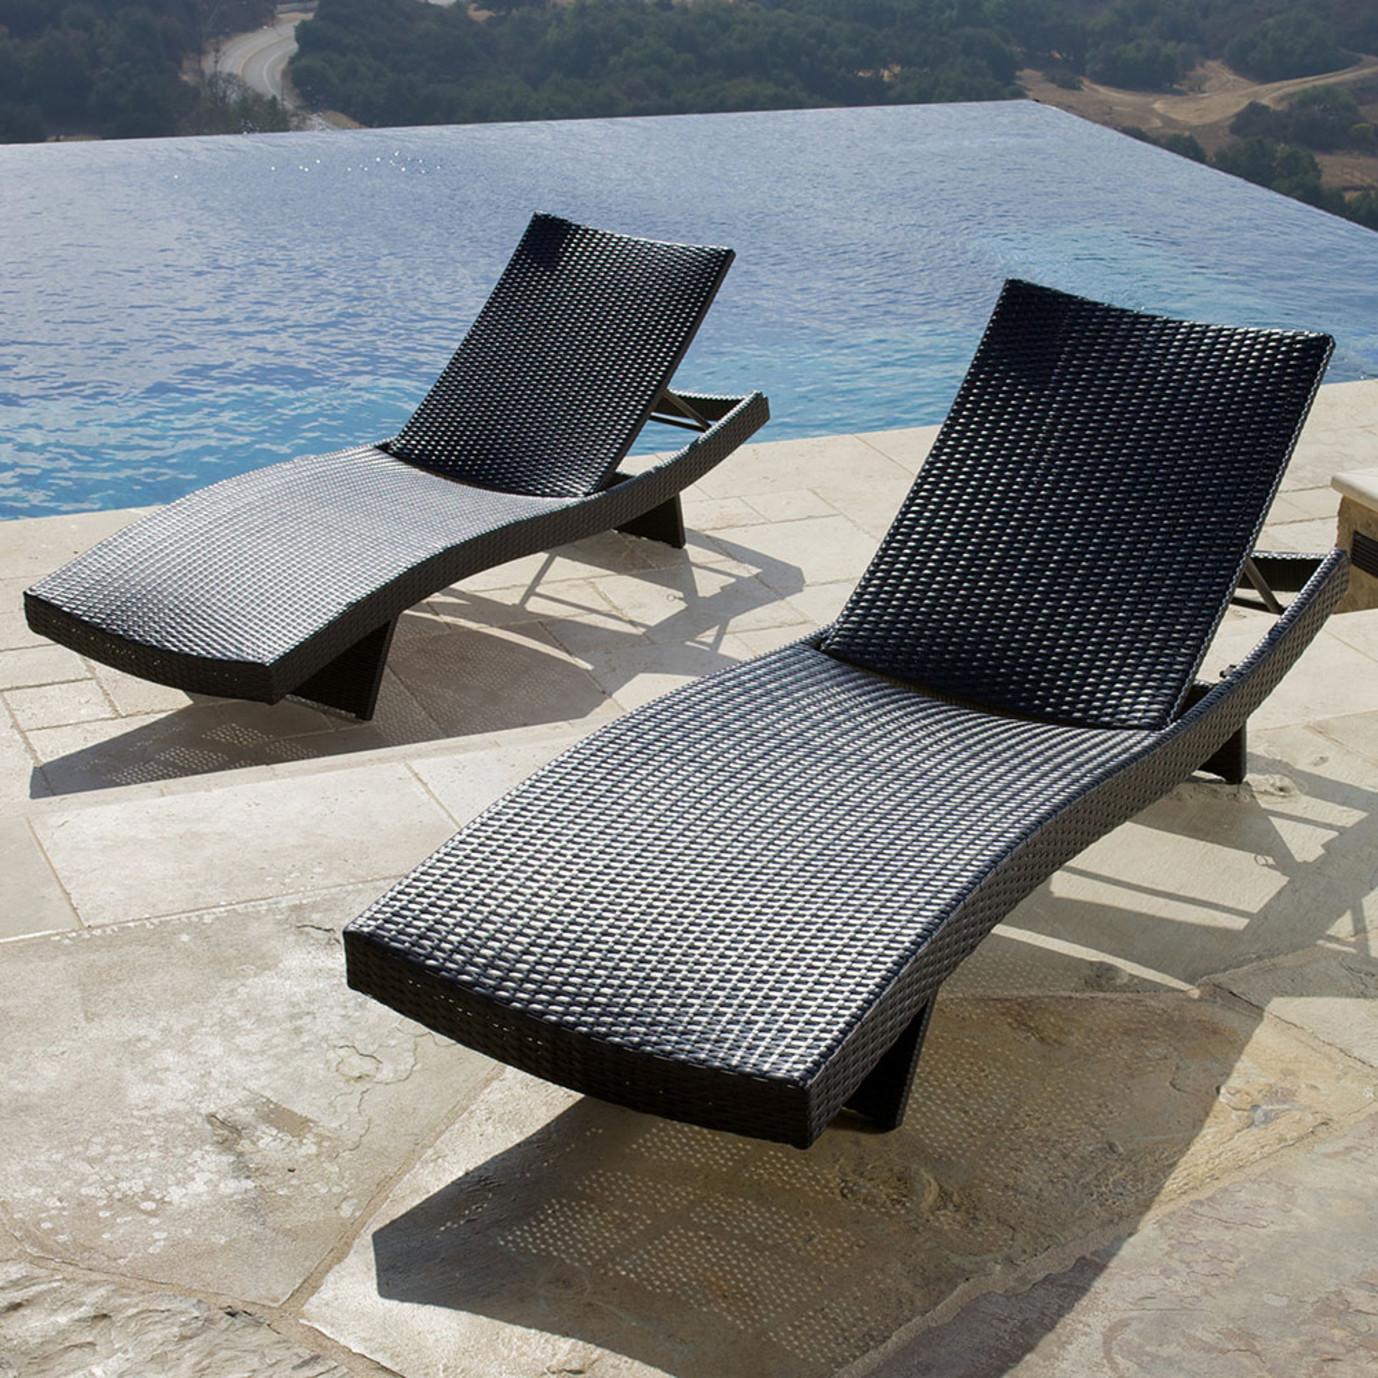 Portofino® Comfort 2 Loungers & Table